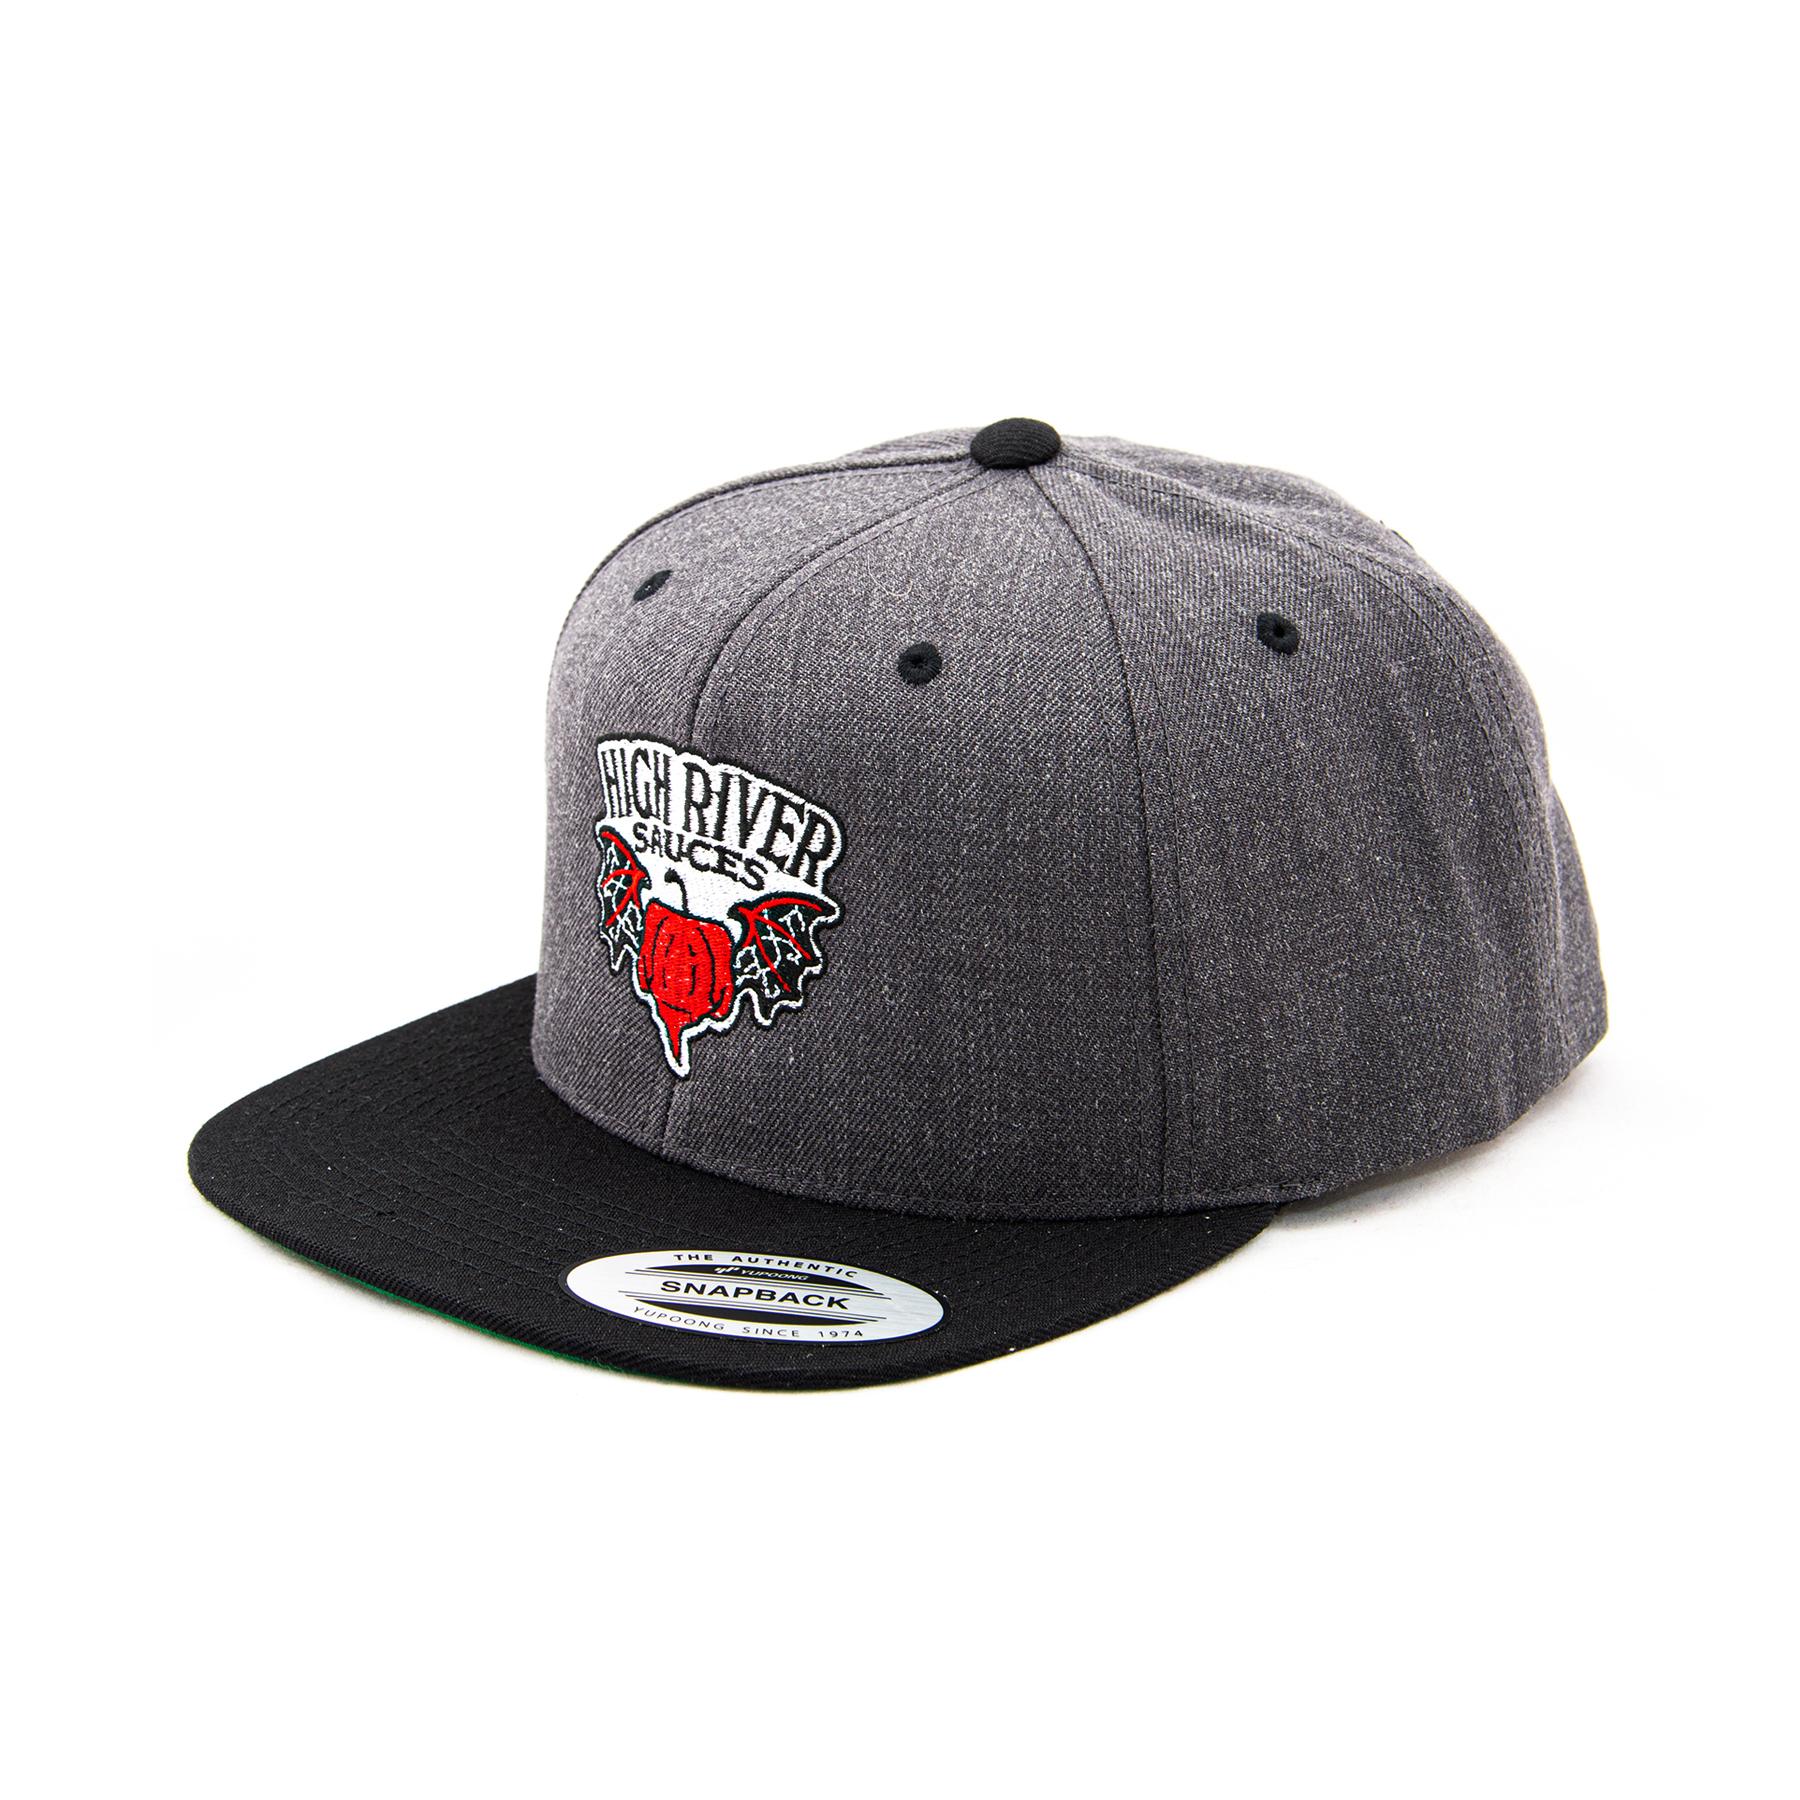 gray hat image 3/4 turn